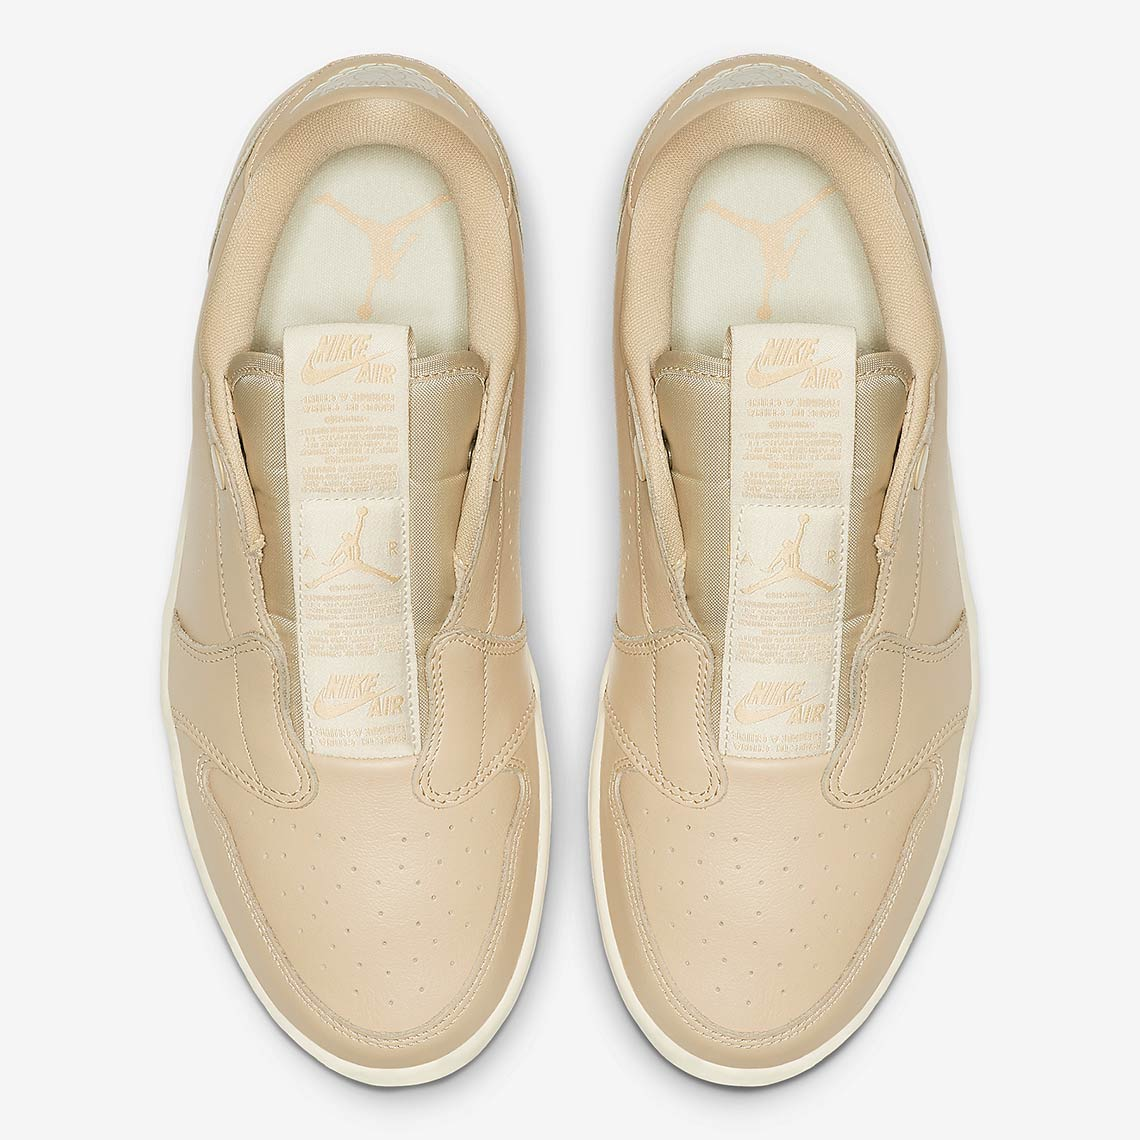 new arrivals bba23 2a1a5 Air Jordan 1 Low Slip-On Wmns  115. Color  Desert Ore Light Cream Style  Code  AV3918-200. Advertisement. Advertisement